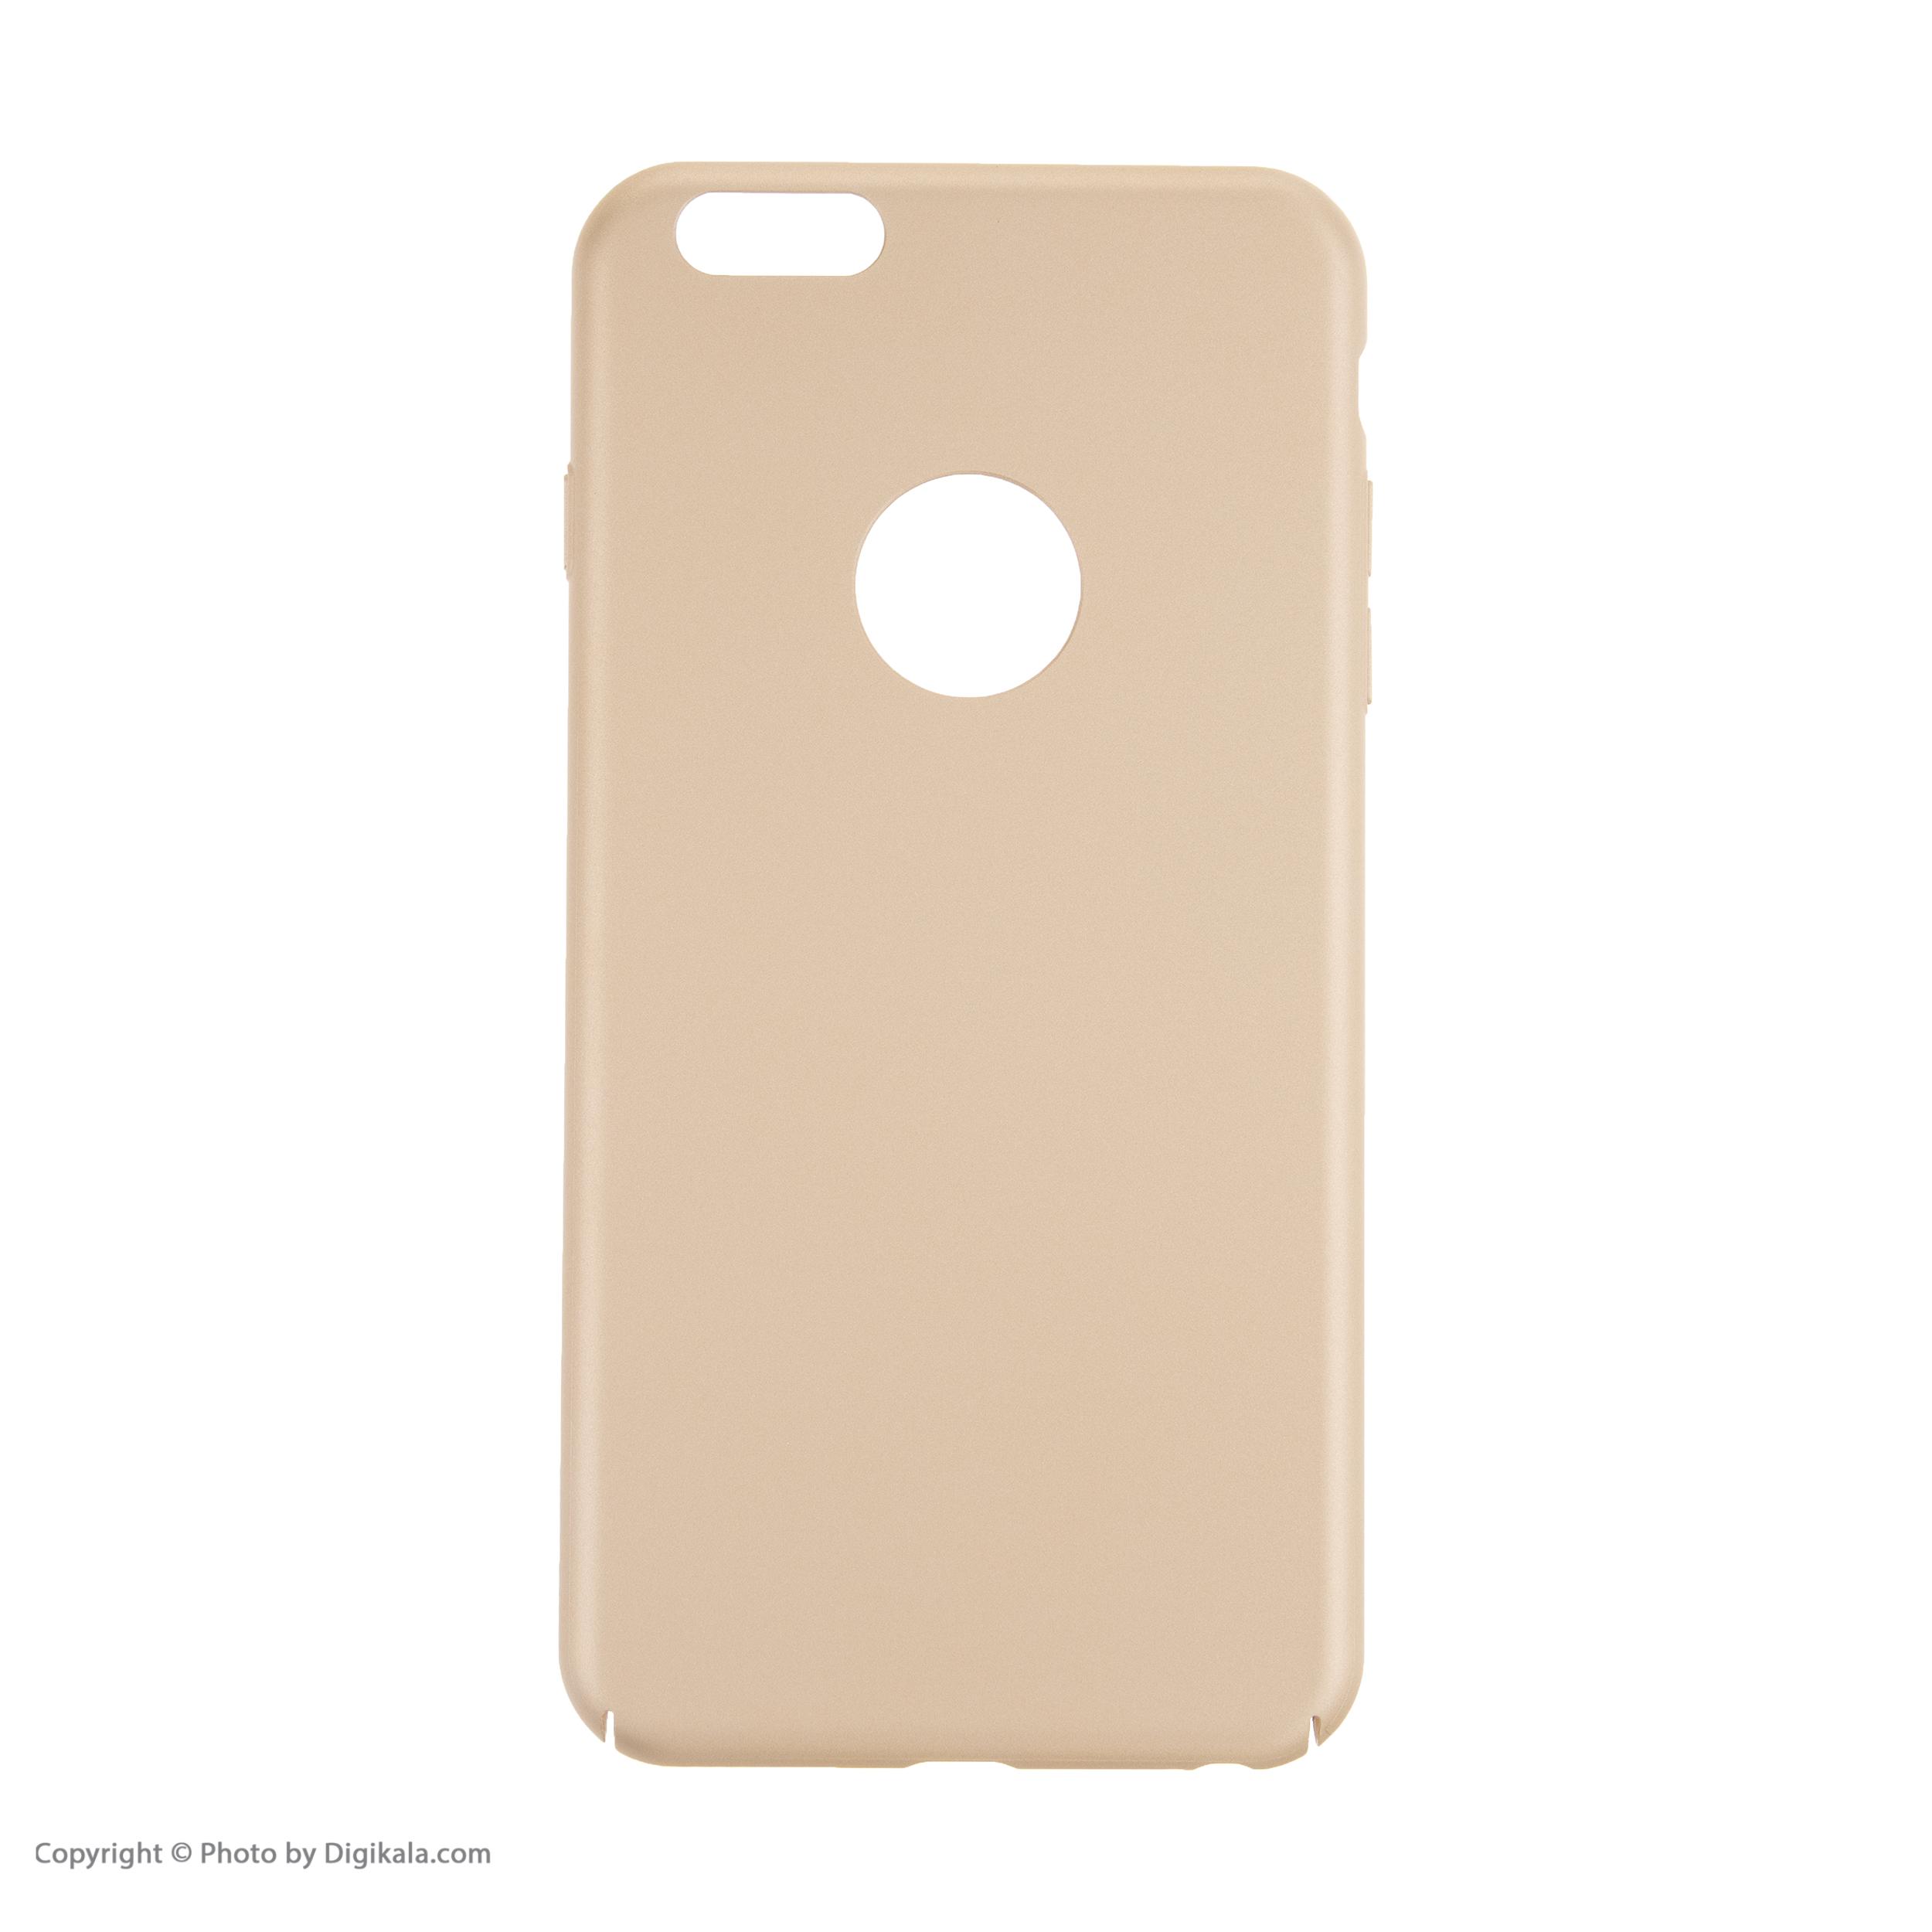 کاور جوی روم مدل JR-BP157 مناسب برای گوشی موبایل اپل iPhone 6 plus/6s plus  main 1 1